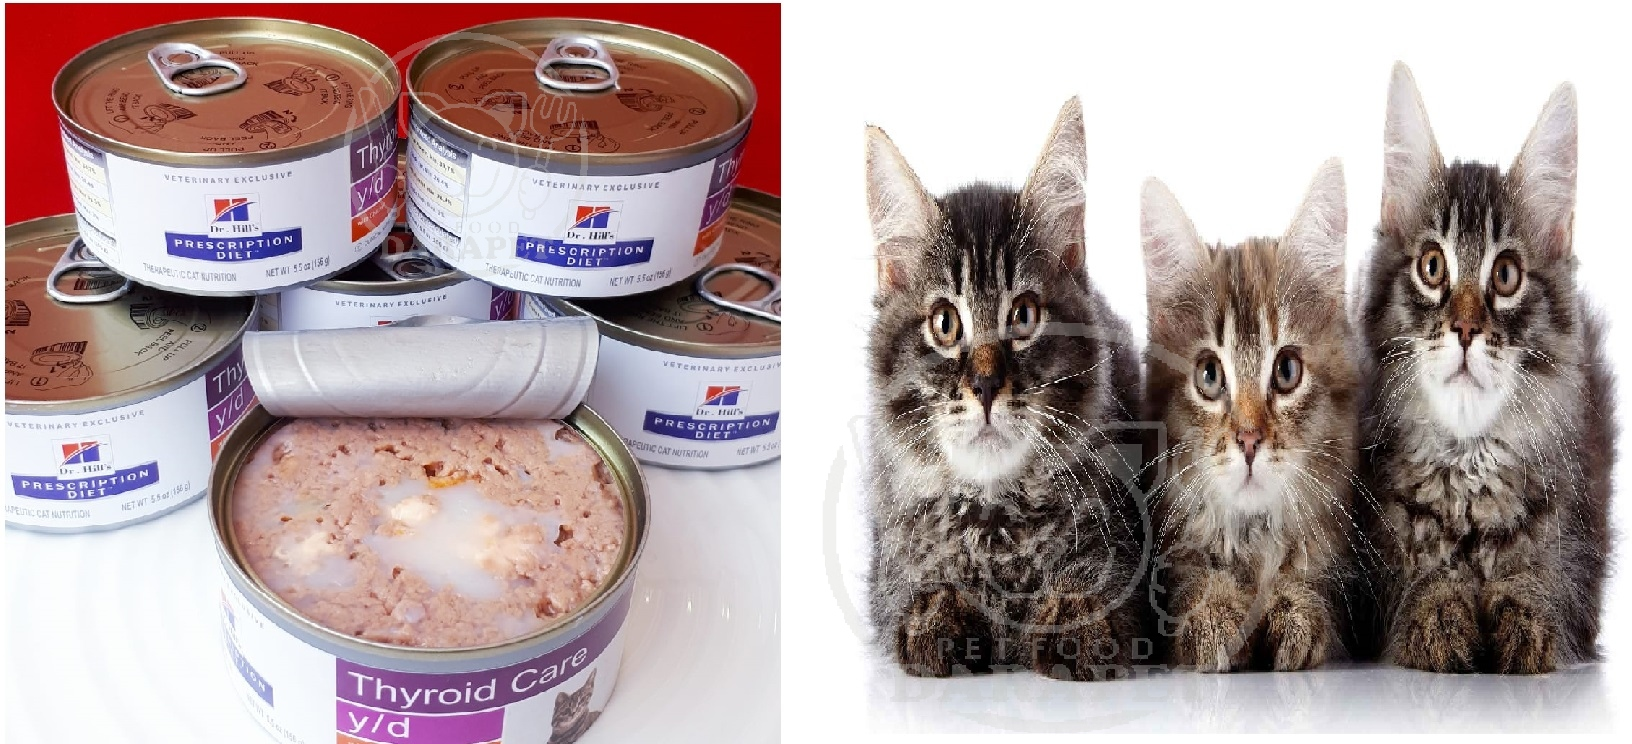 نرخ خوراک گربه پرشین